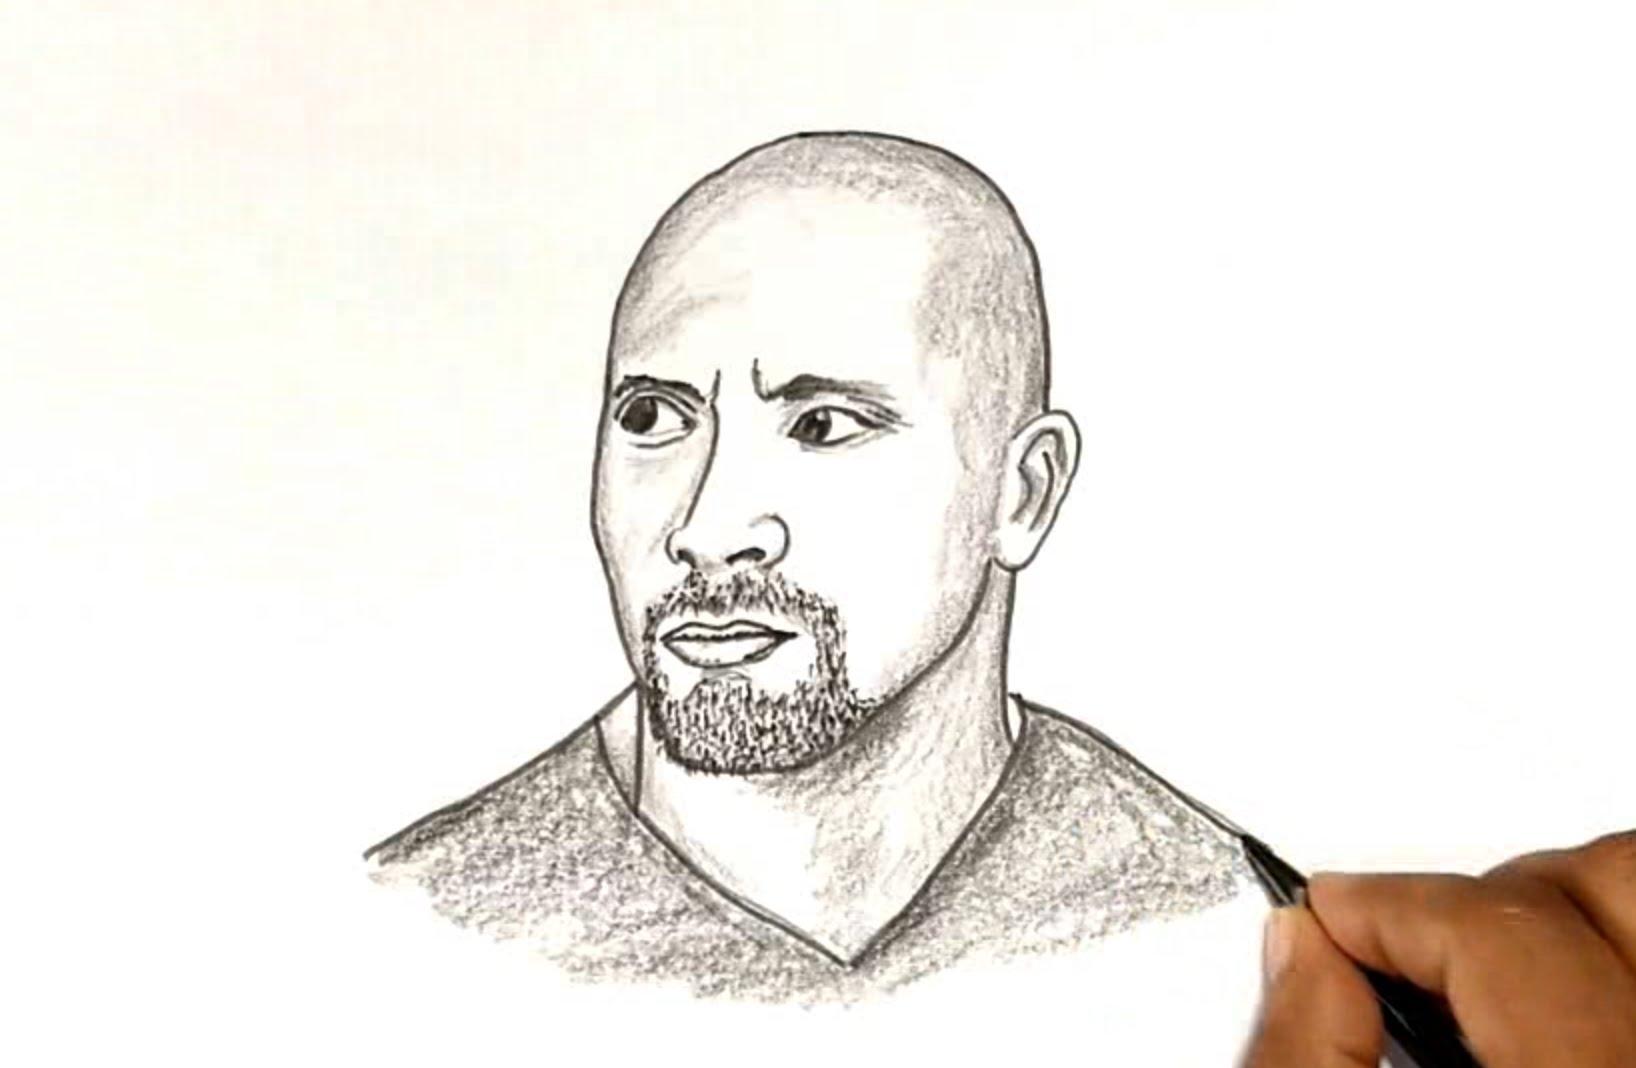 Drawn bull wwe the rock To YouTube Rock Rock Johnson)